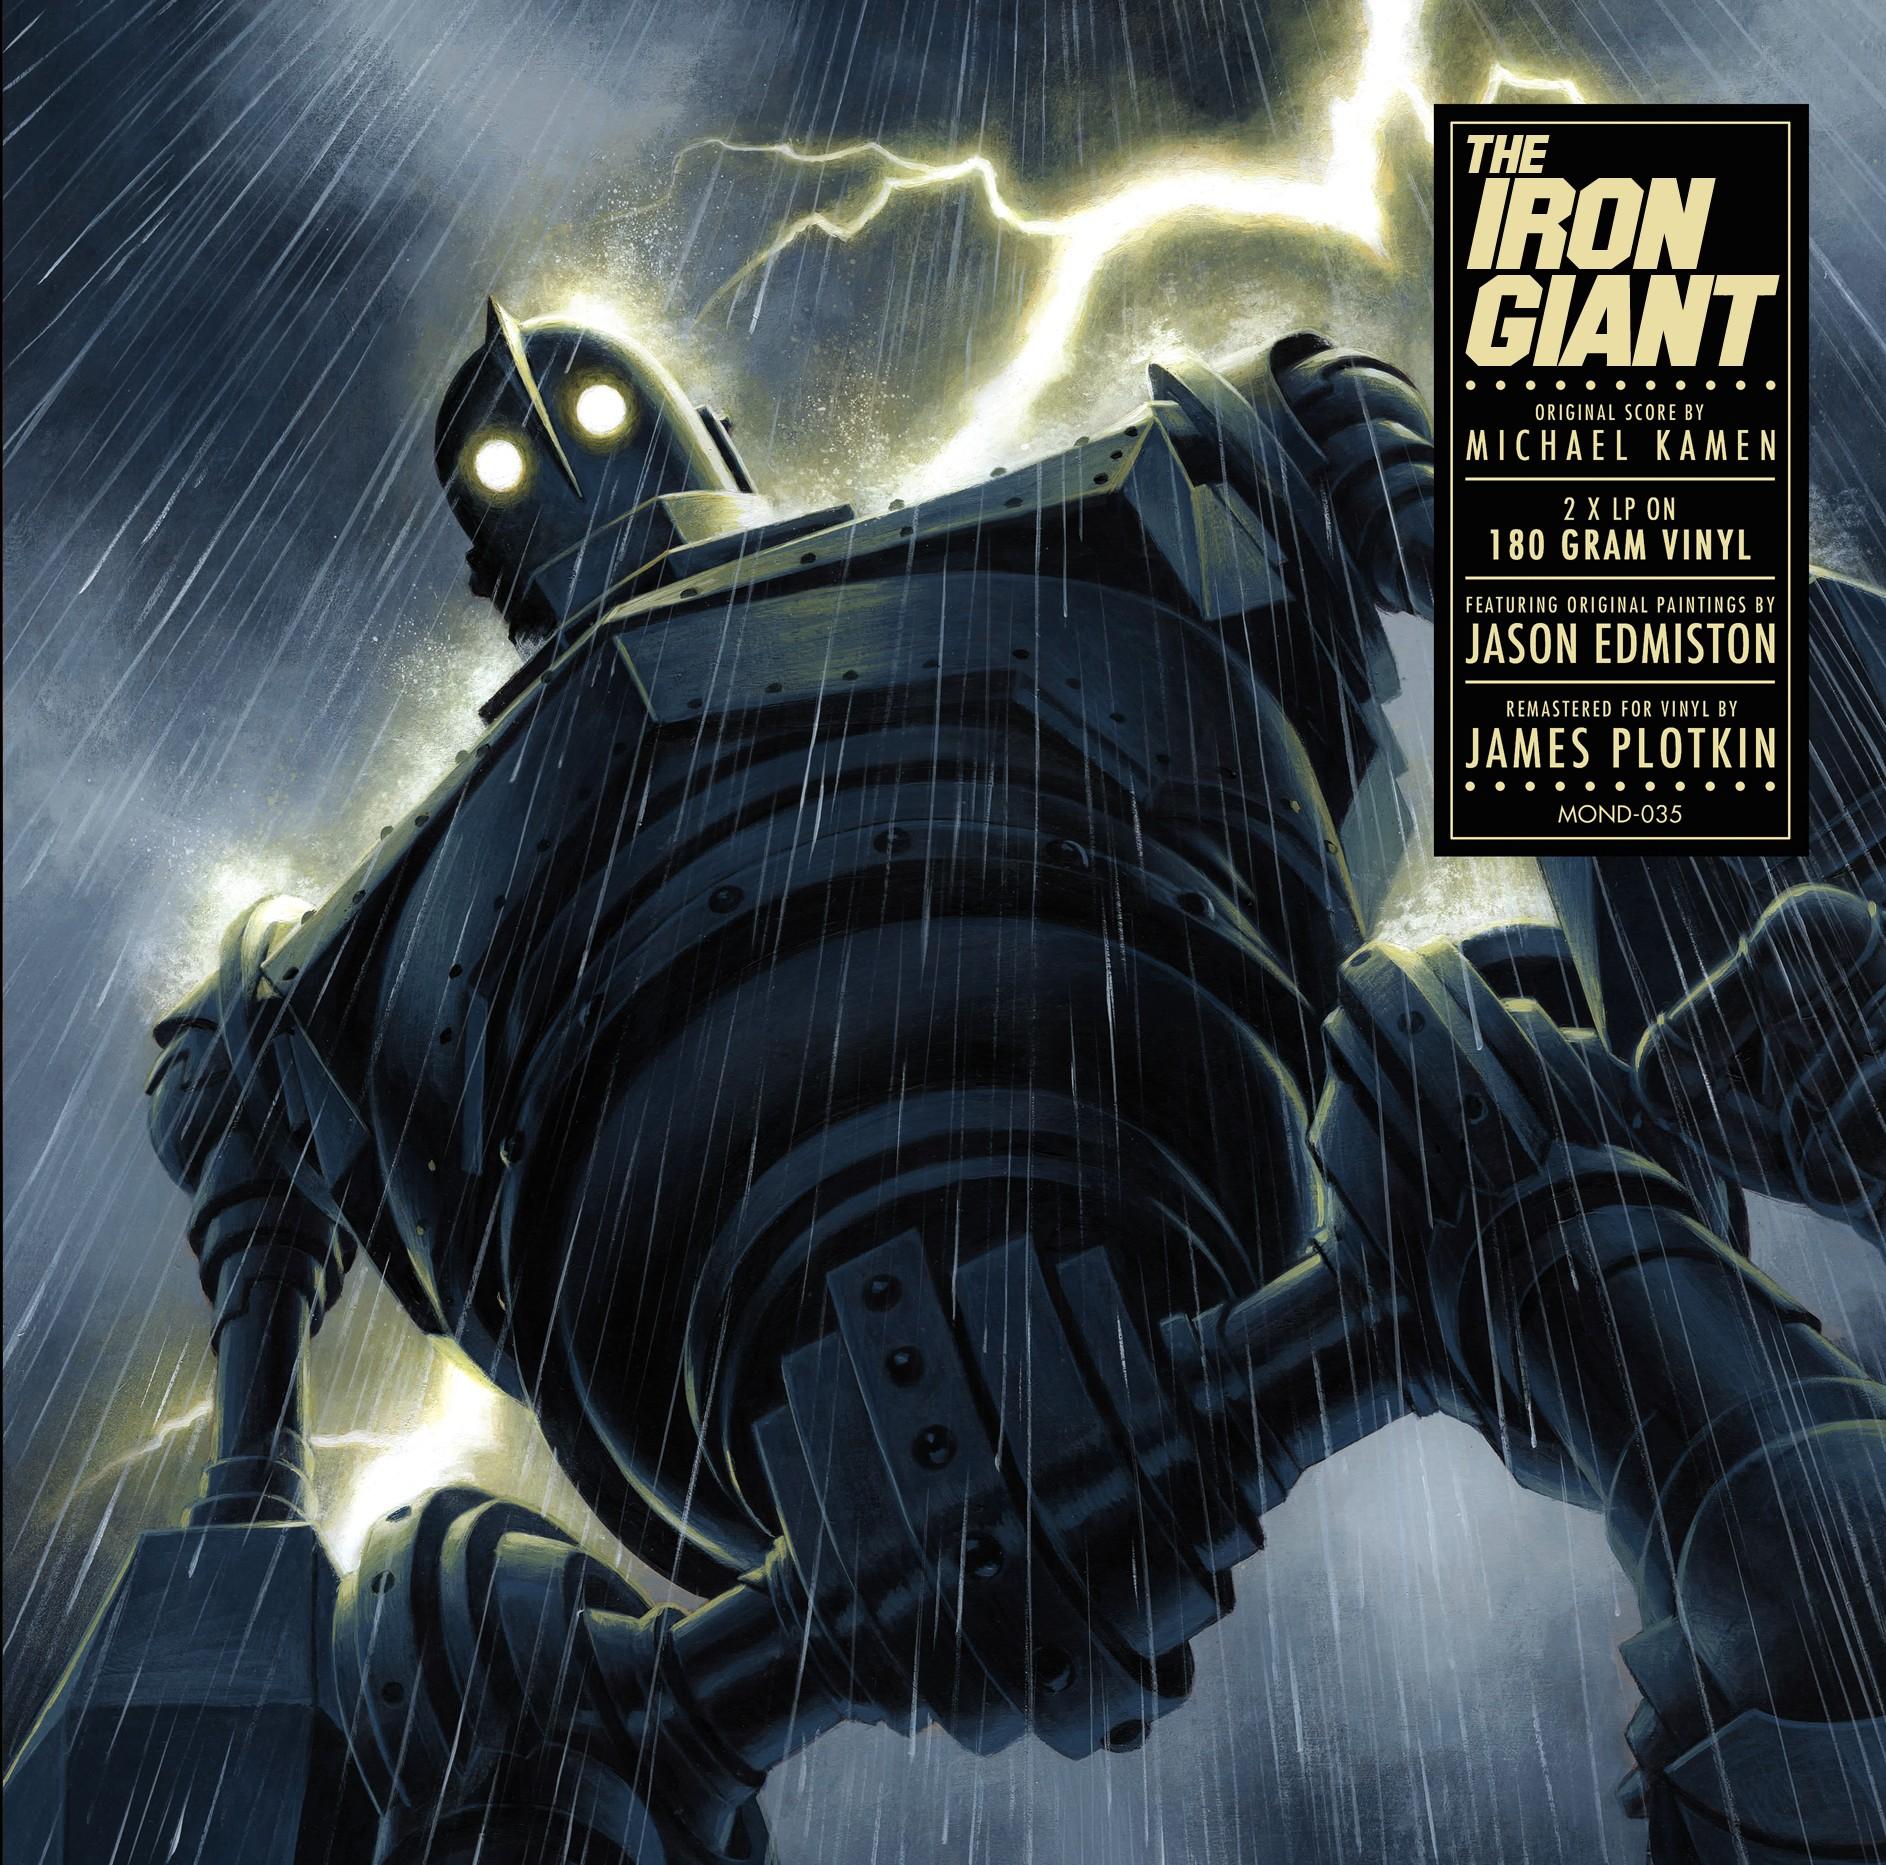 Michael Kamen - The Iron Giant (Original Score) 2XLP